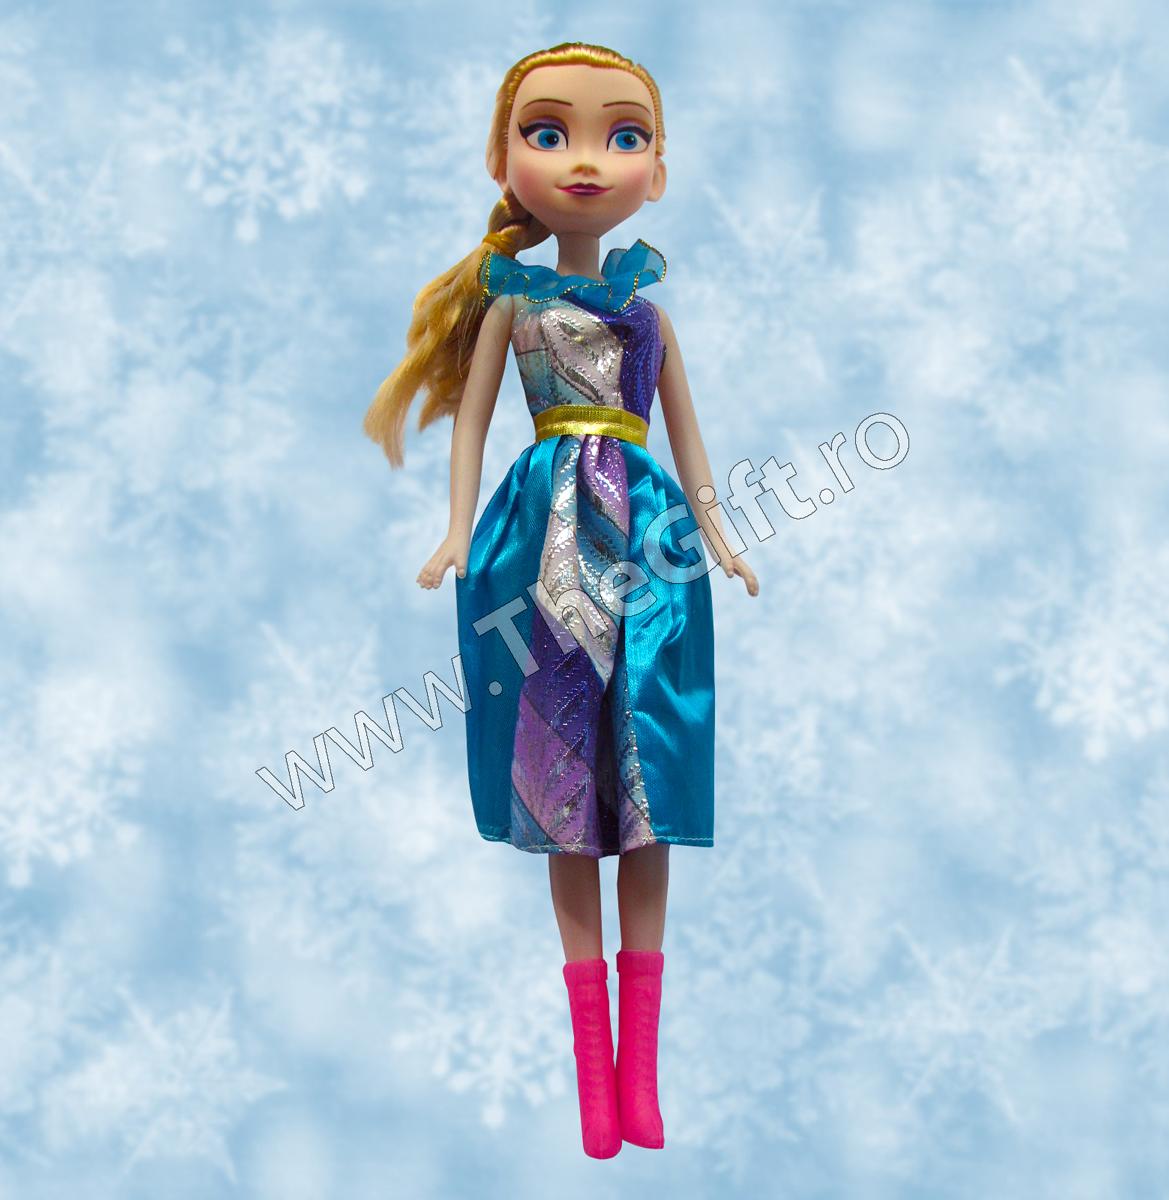 Papusa Elsa din Frozen